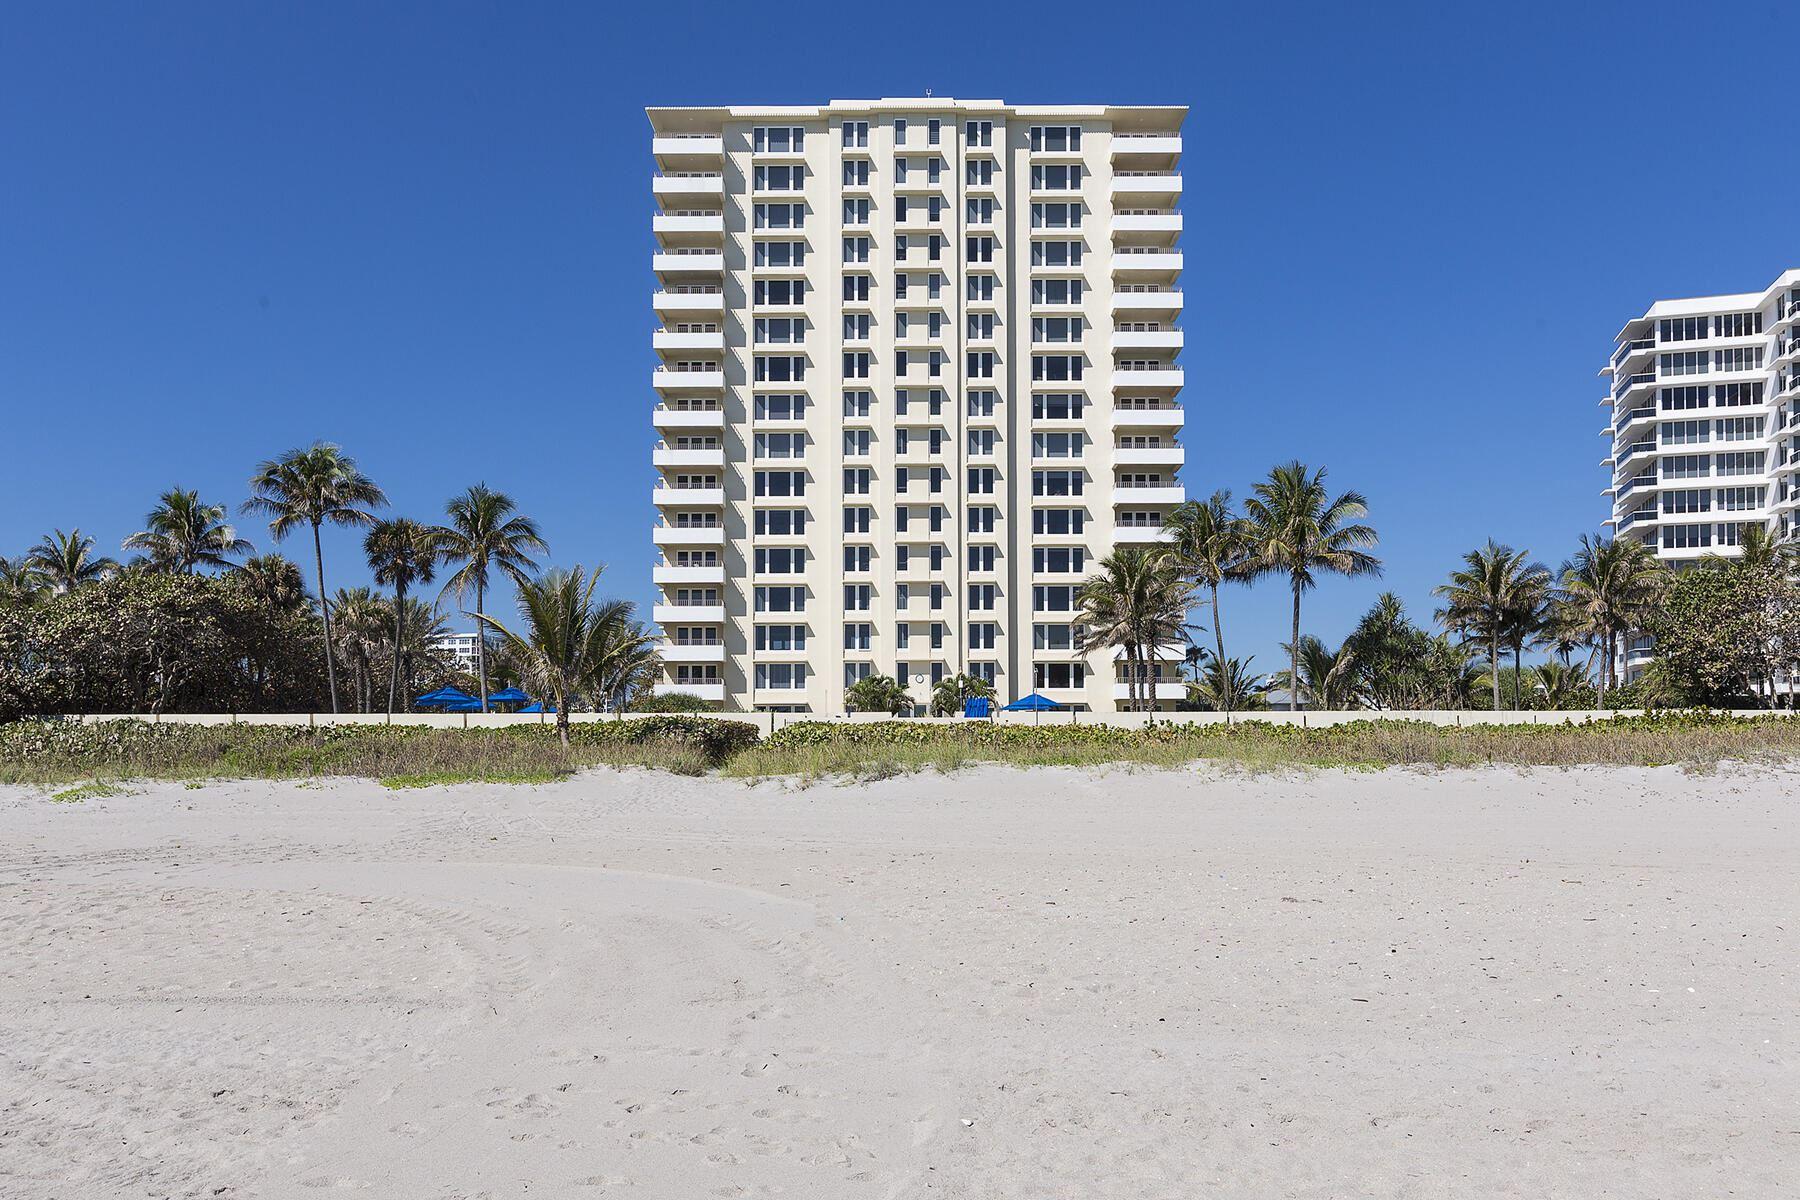 Photo of 750 S Ocean Boulevard #6s, Boca Raton, FL 33432 (MLS # RX-10697211)